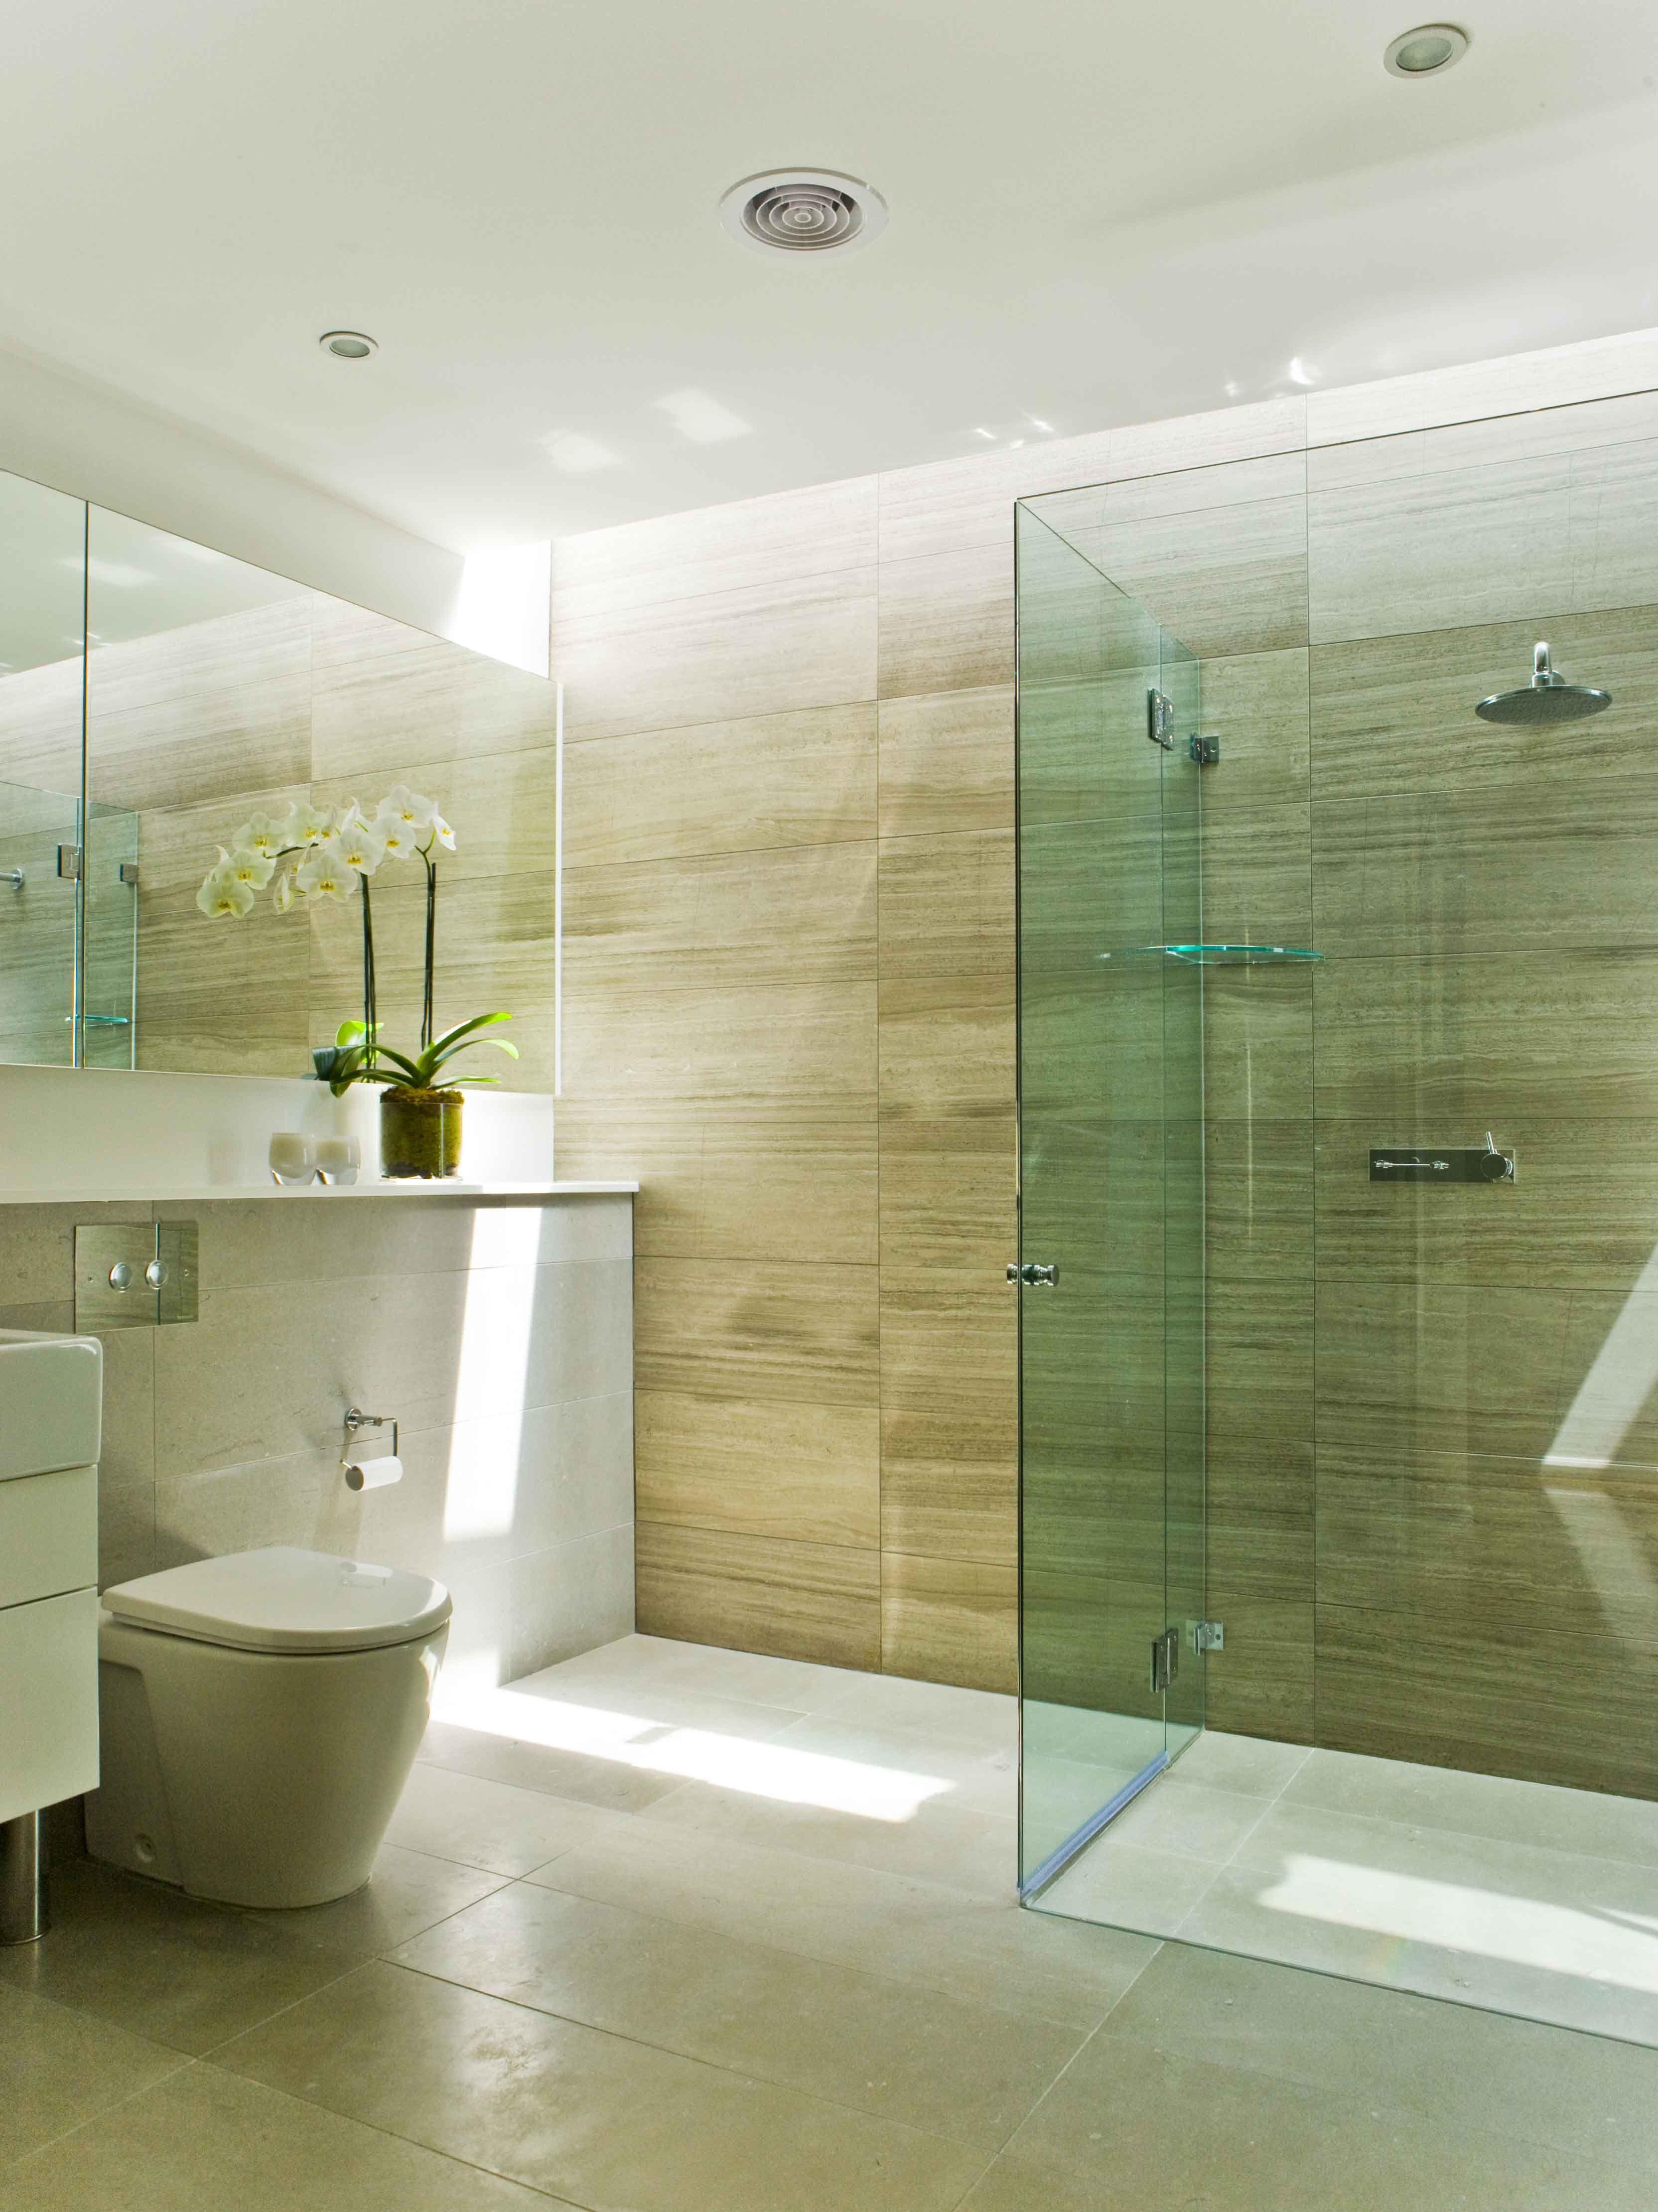 Bathroom tiles perth prices ideas pinterest bathroom tiling bathroom tiles perth prices dailygadgetfo Choice Image